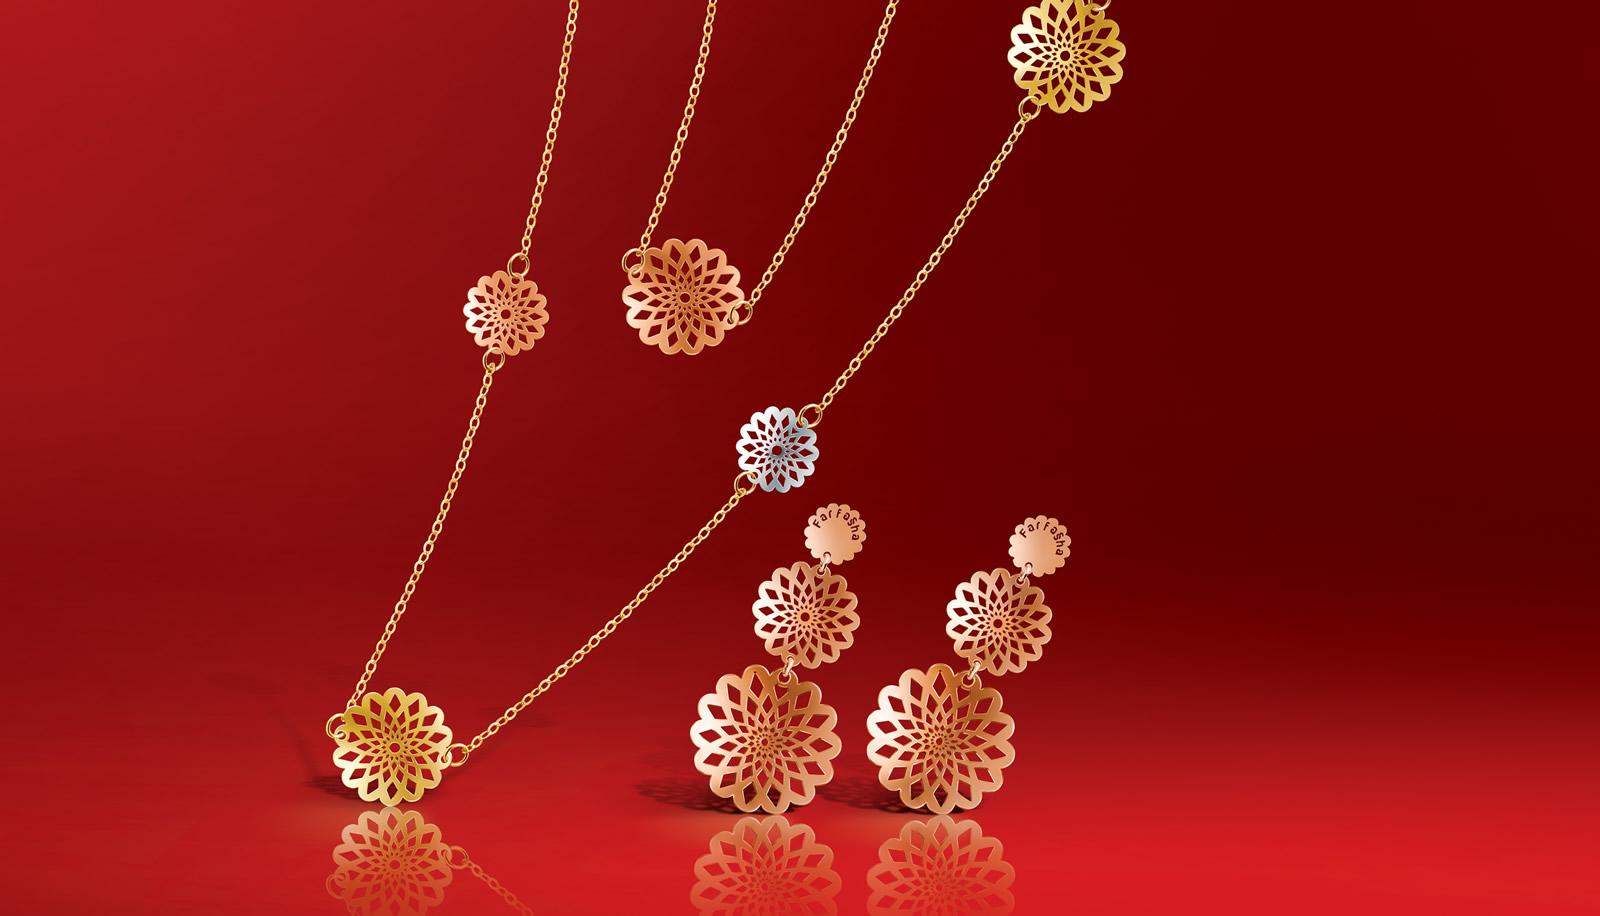 بالصور مجوهرات داماس , اجمل اشكال موديلات داماس 1774 6